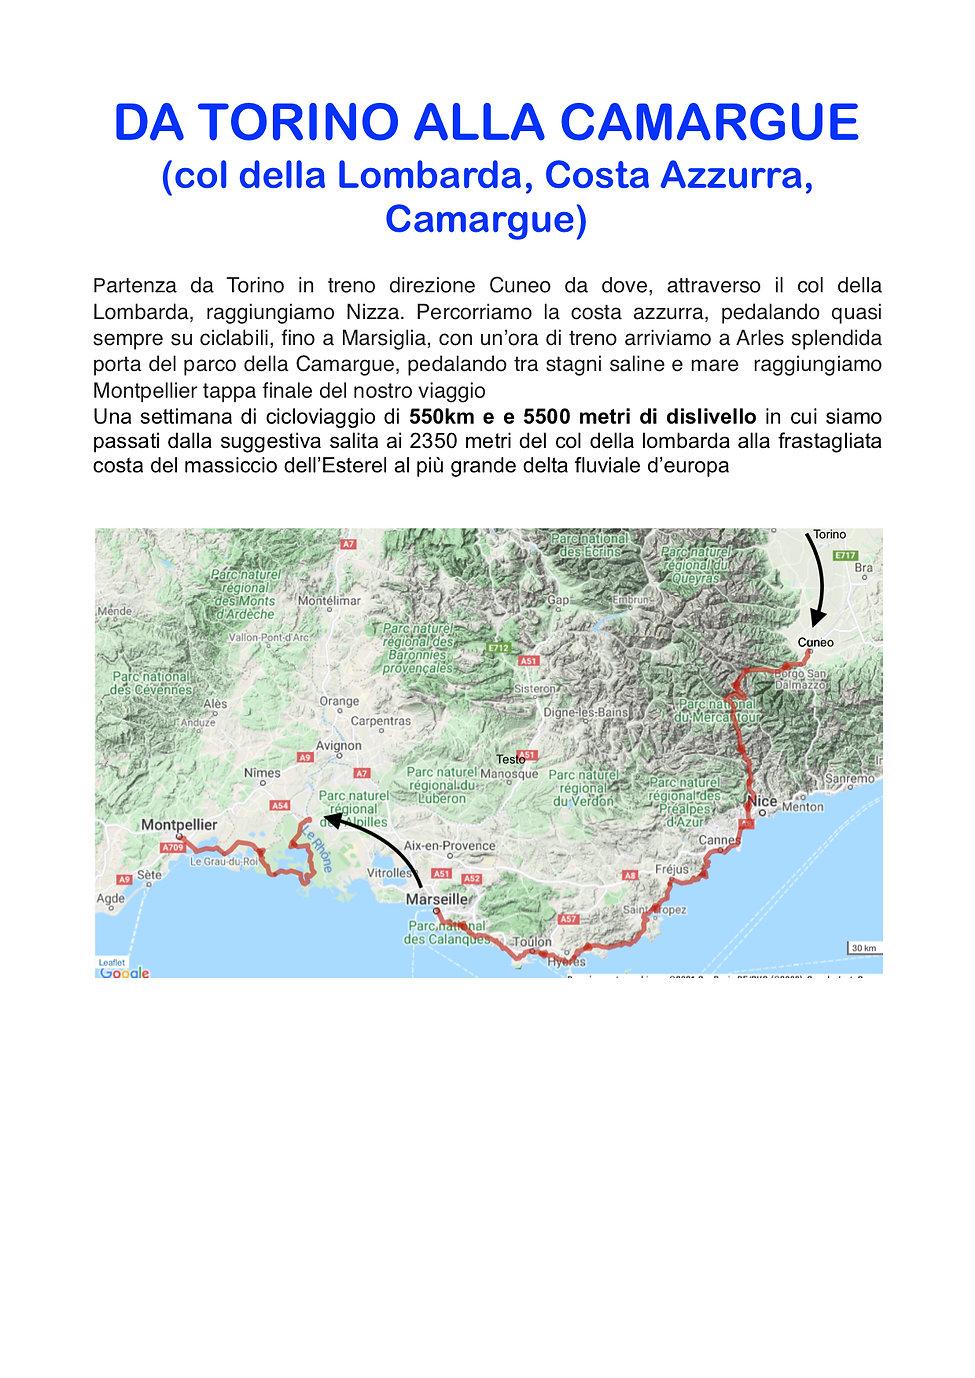 camargue1.jpg